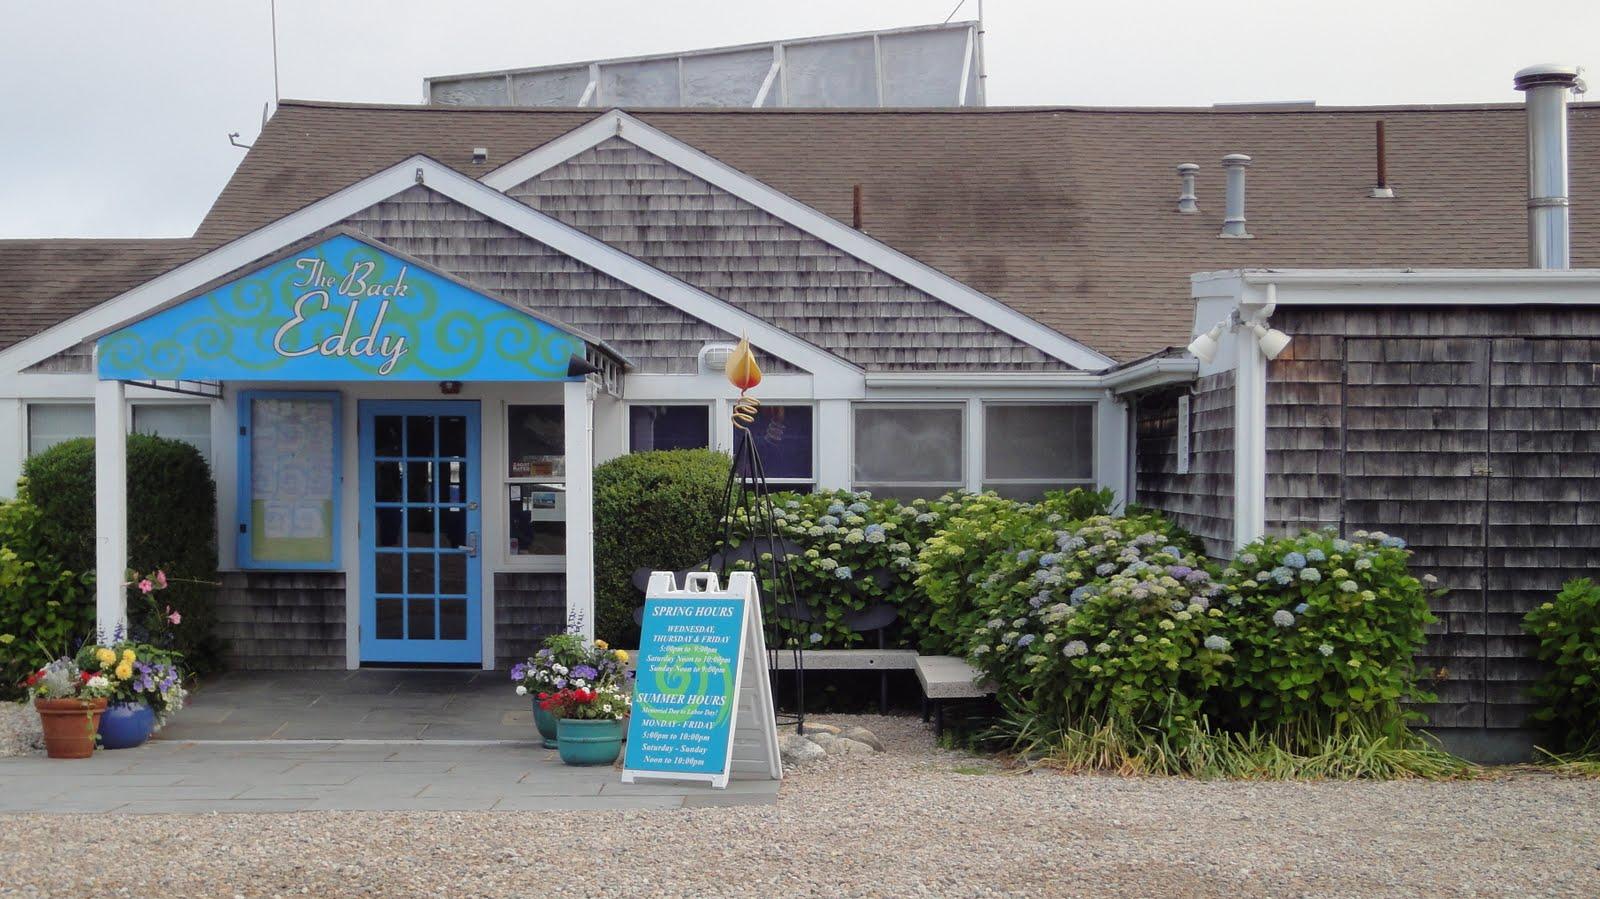 Rhode island is my oyster westport ma the back eddy for The westport